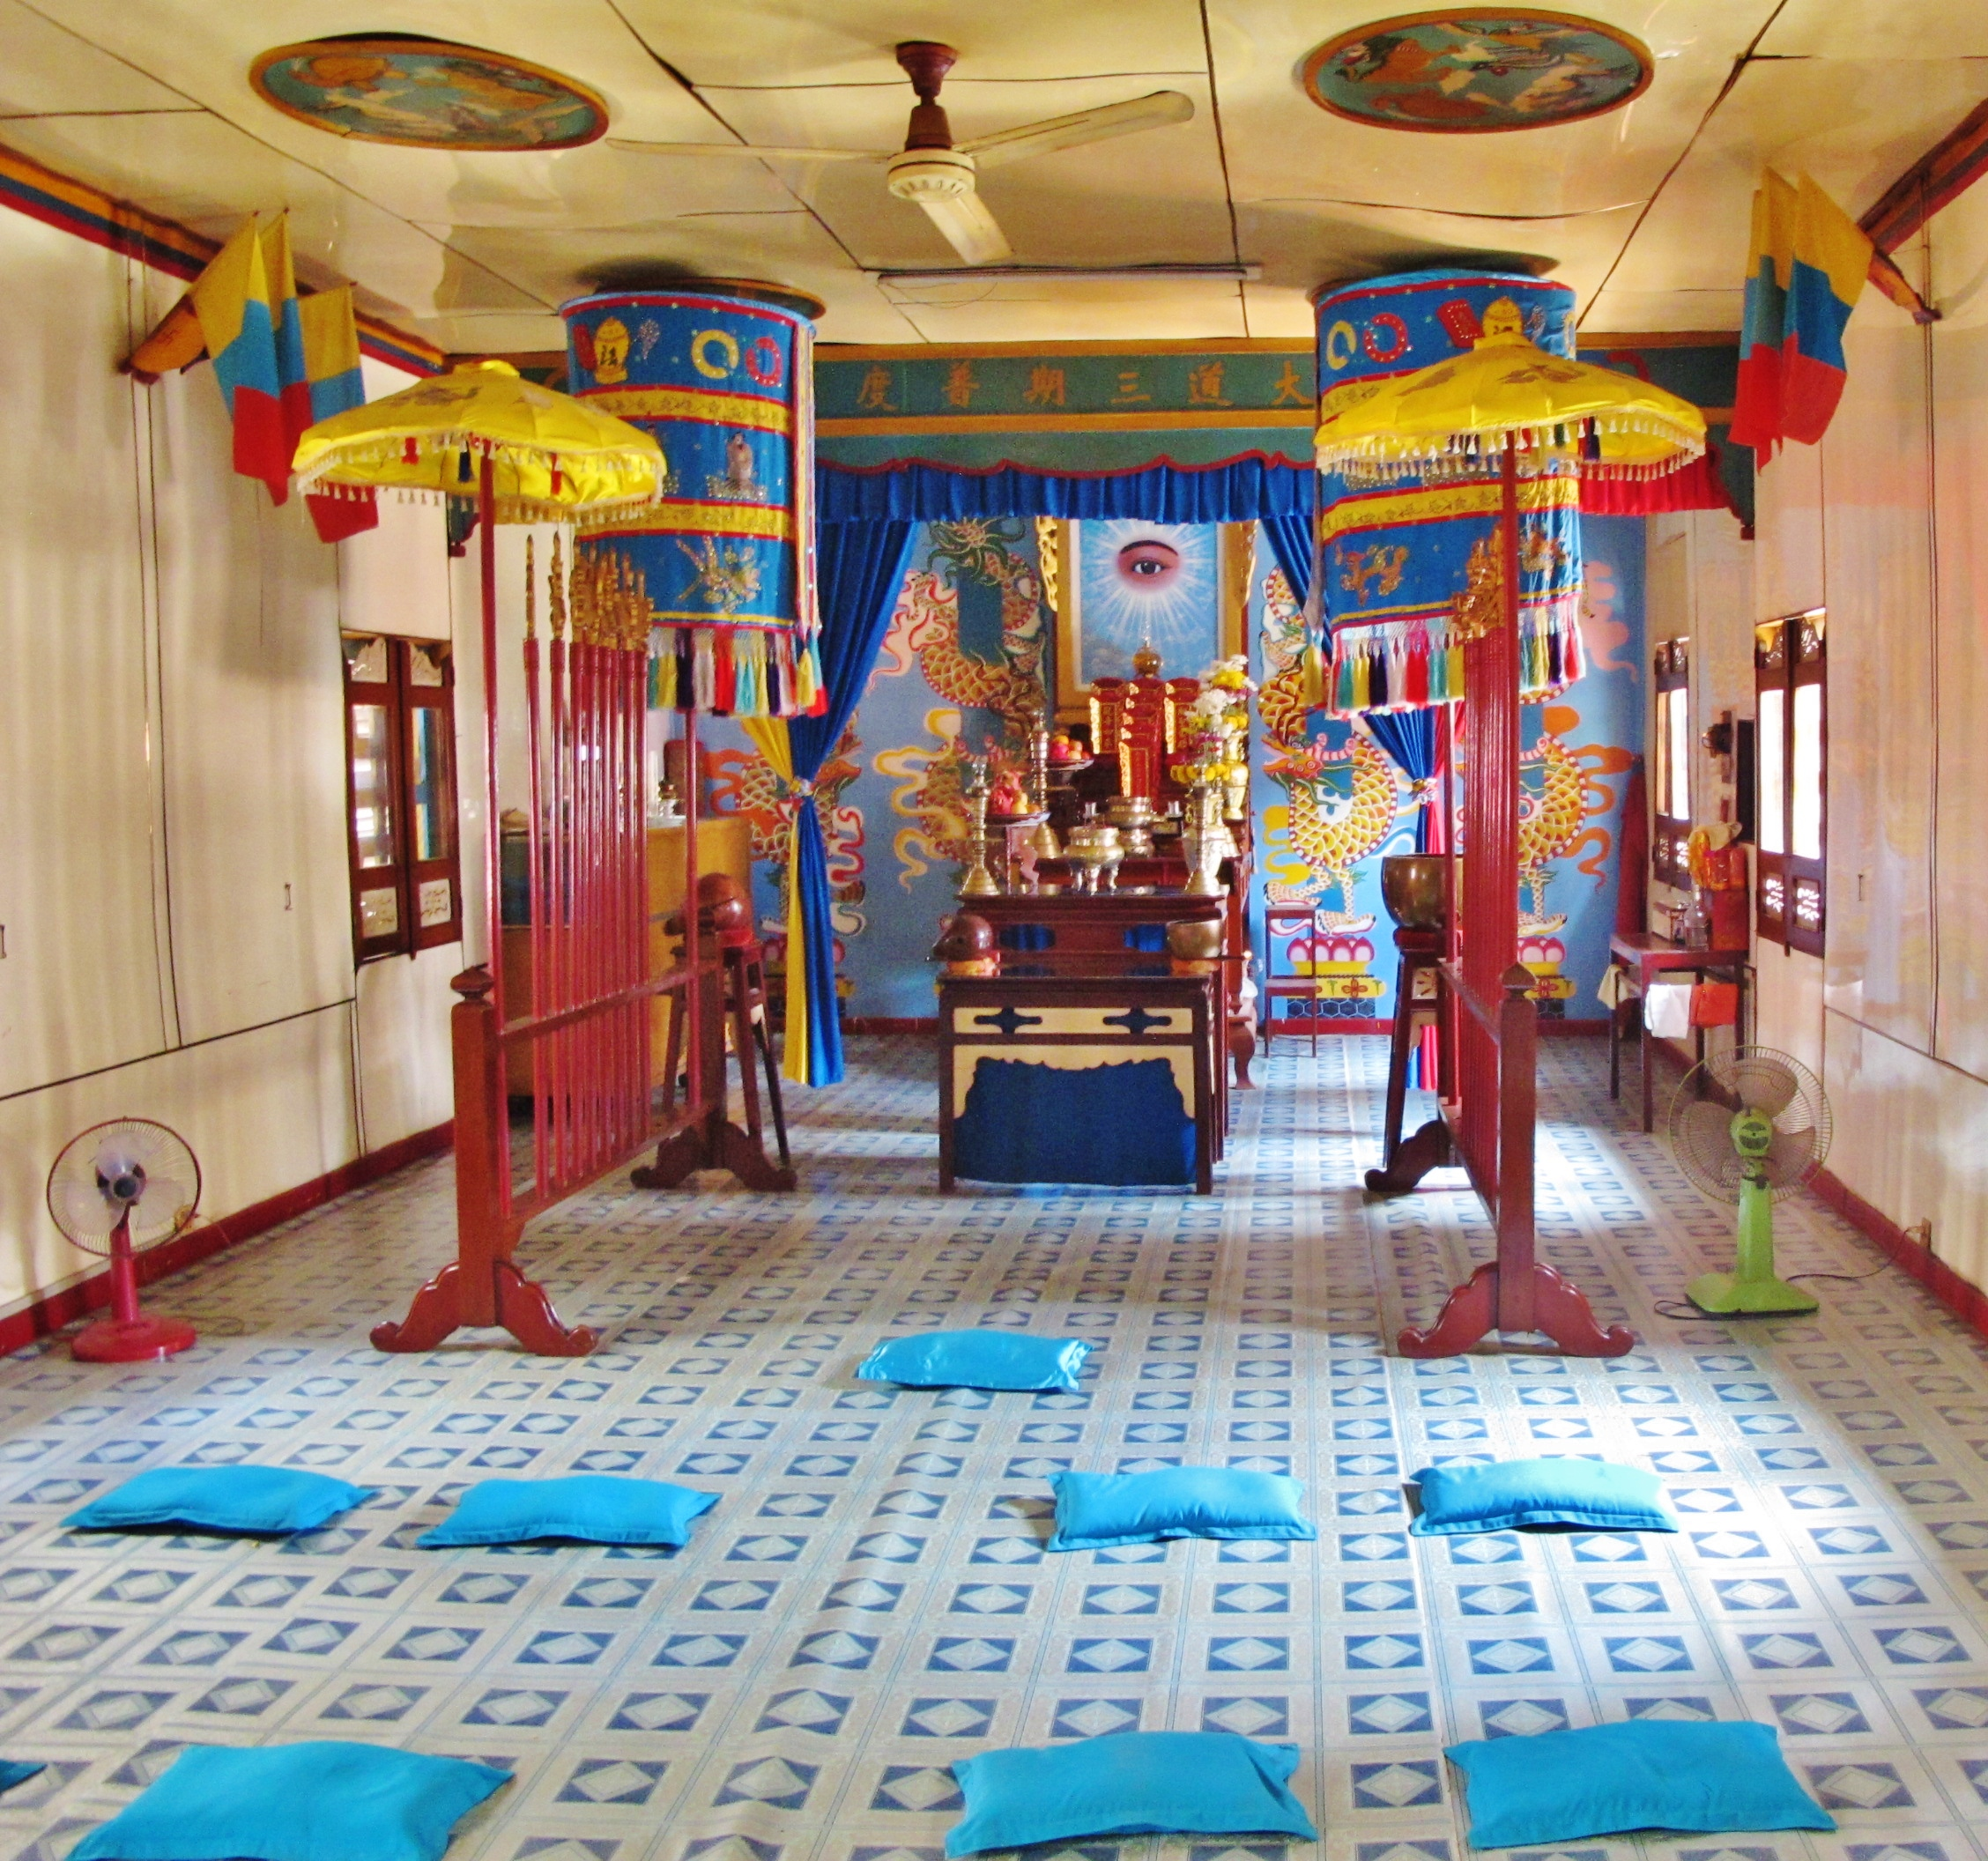 Temples in Cambodia